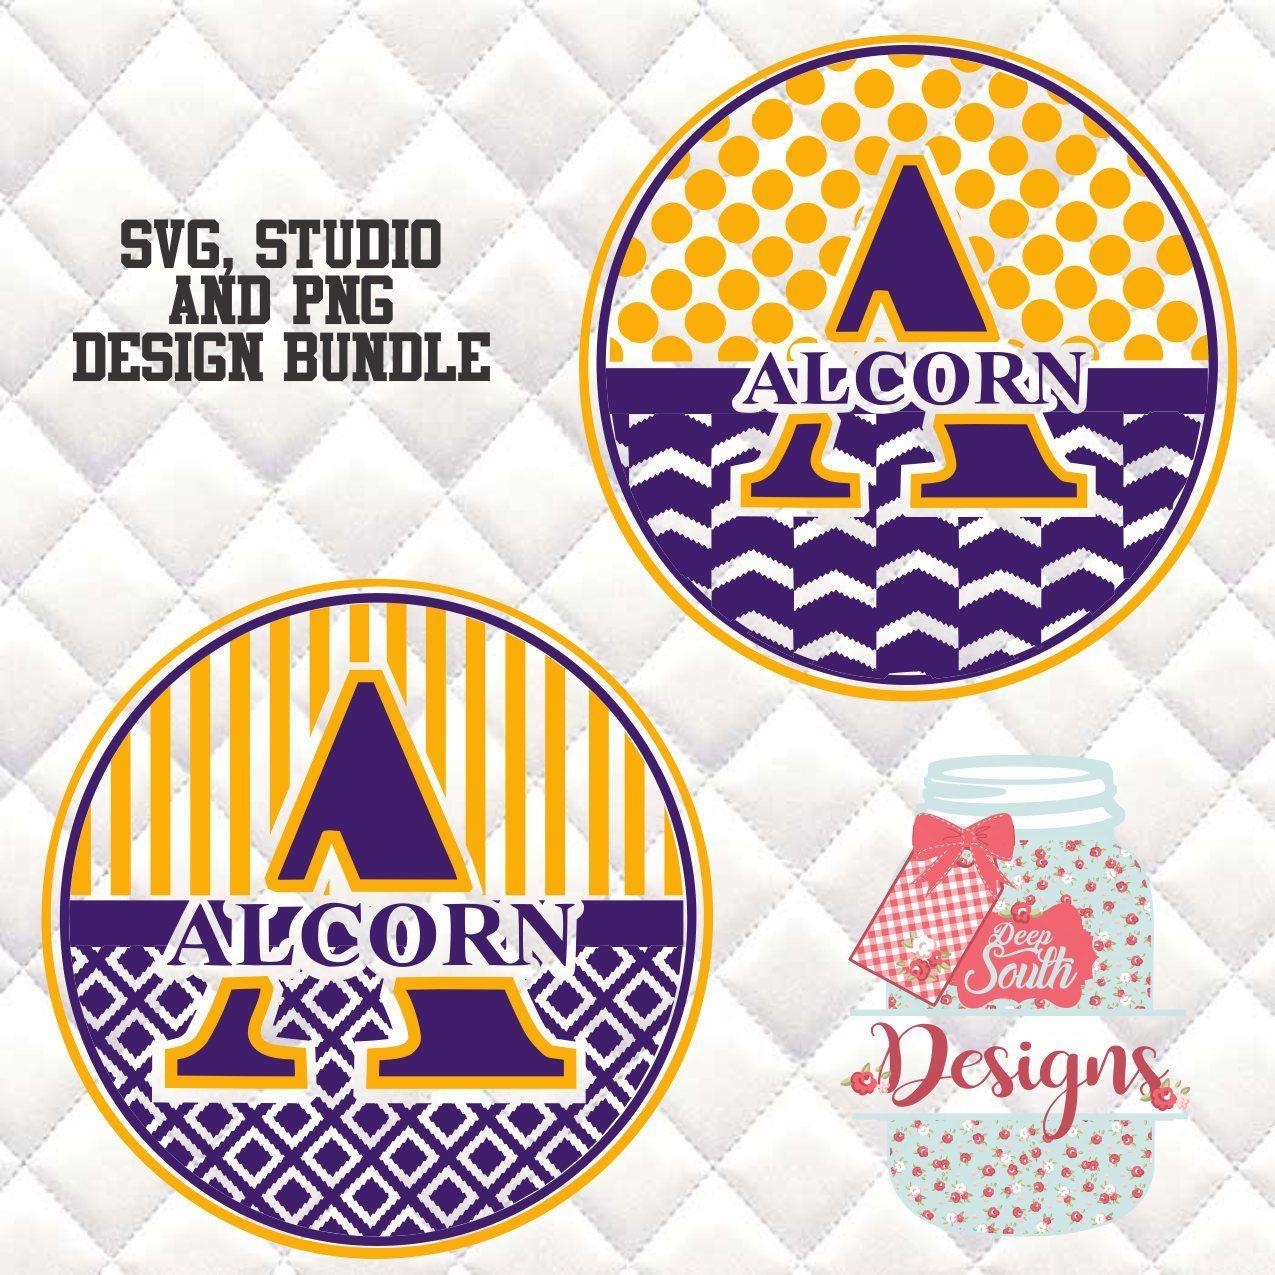 Alcorn State Braves Svg Silhouette Studio Bundle 2 Design Download Svg Silhouette Studio Design